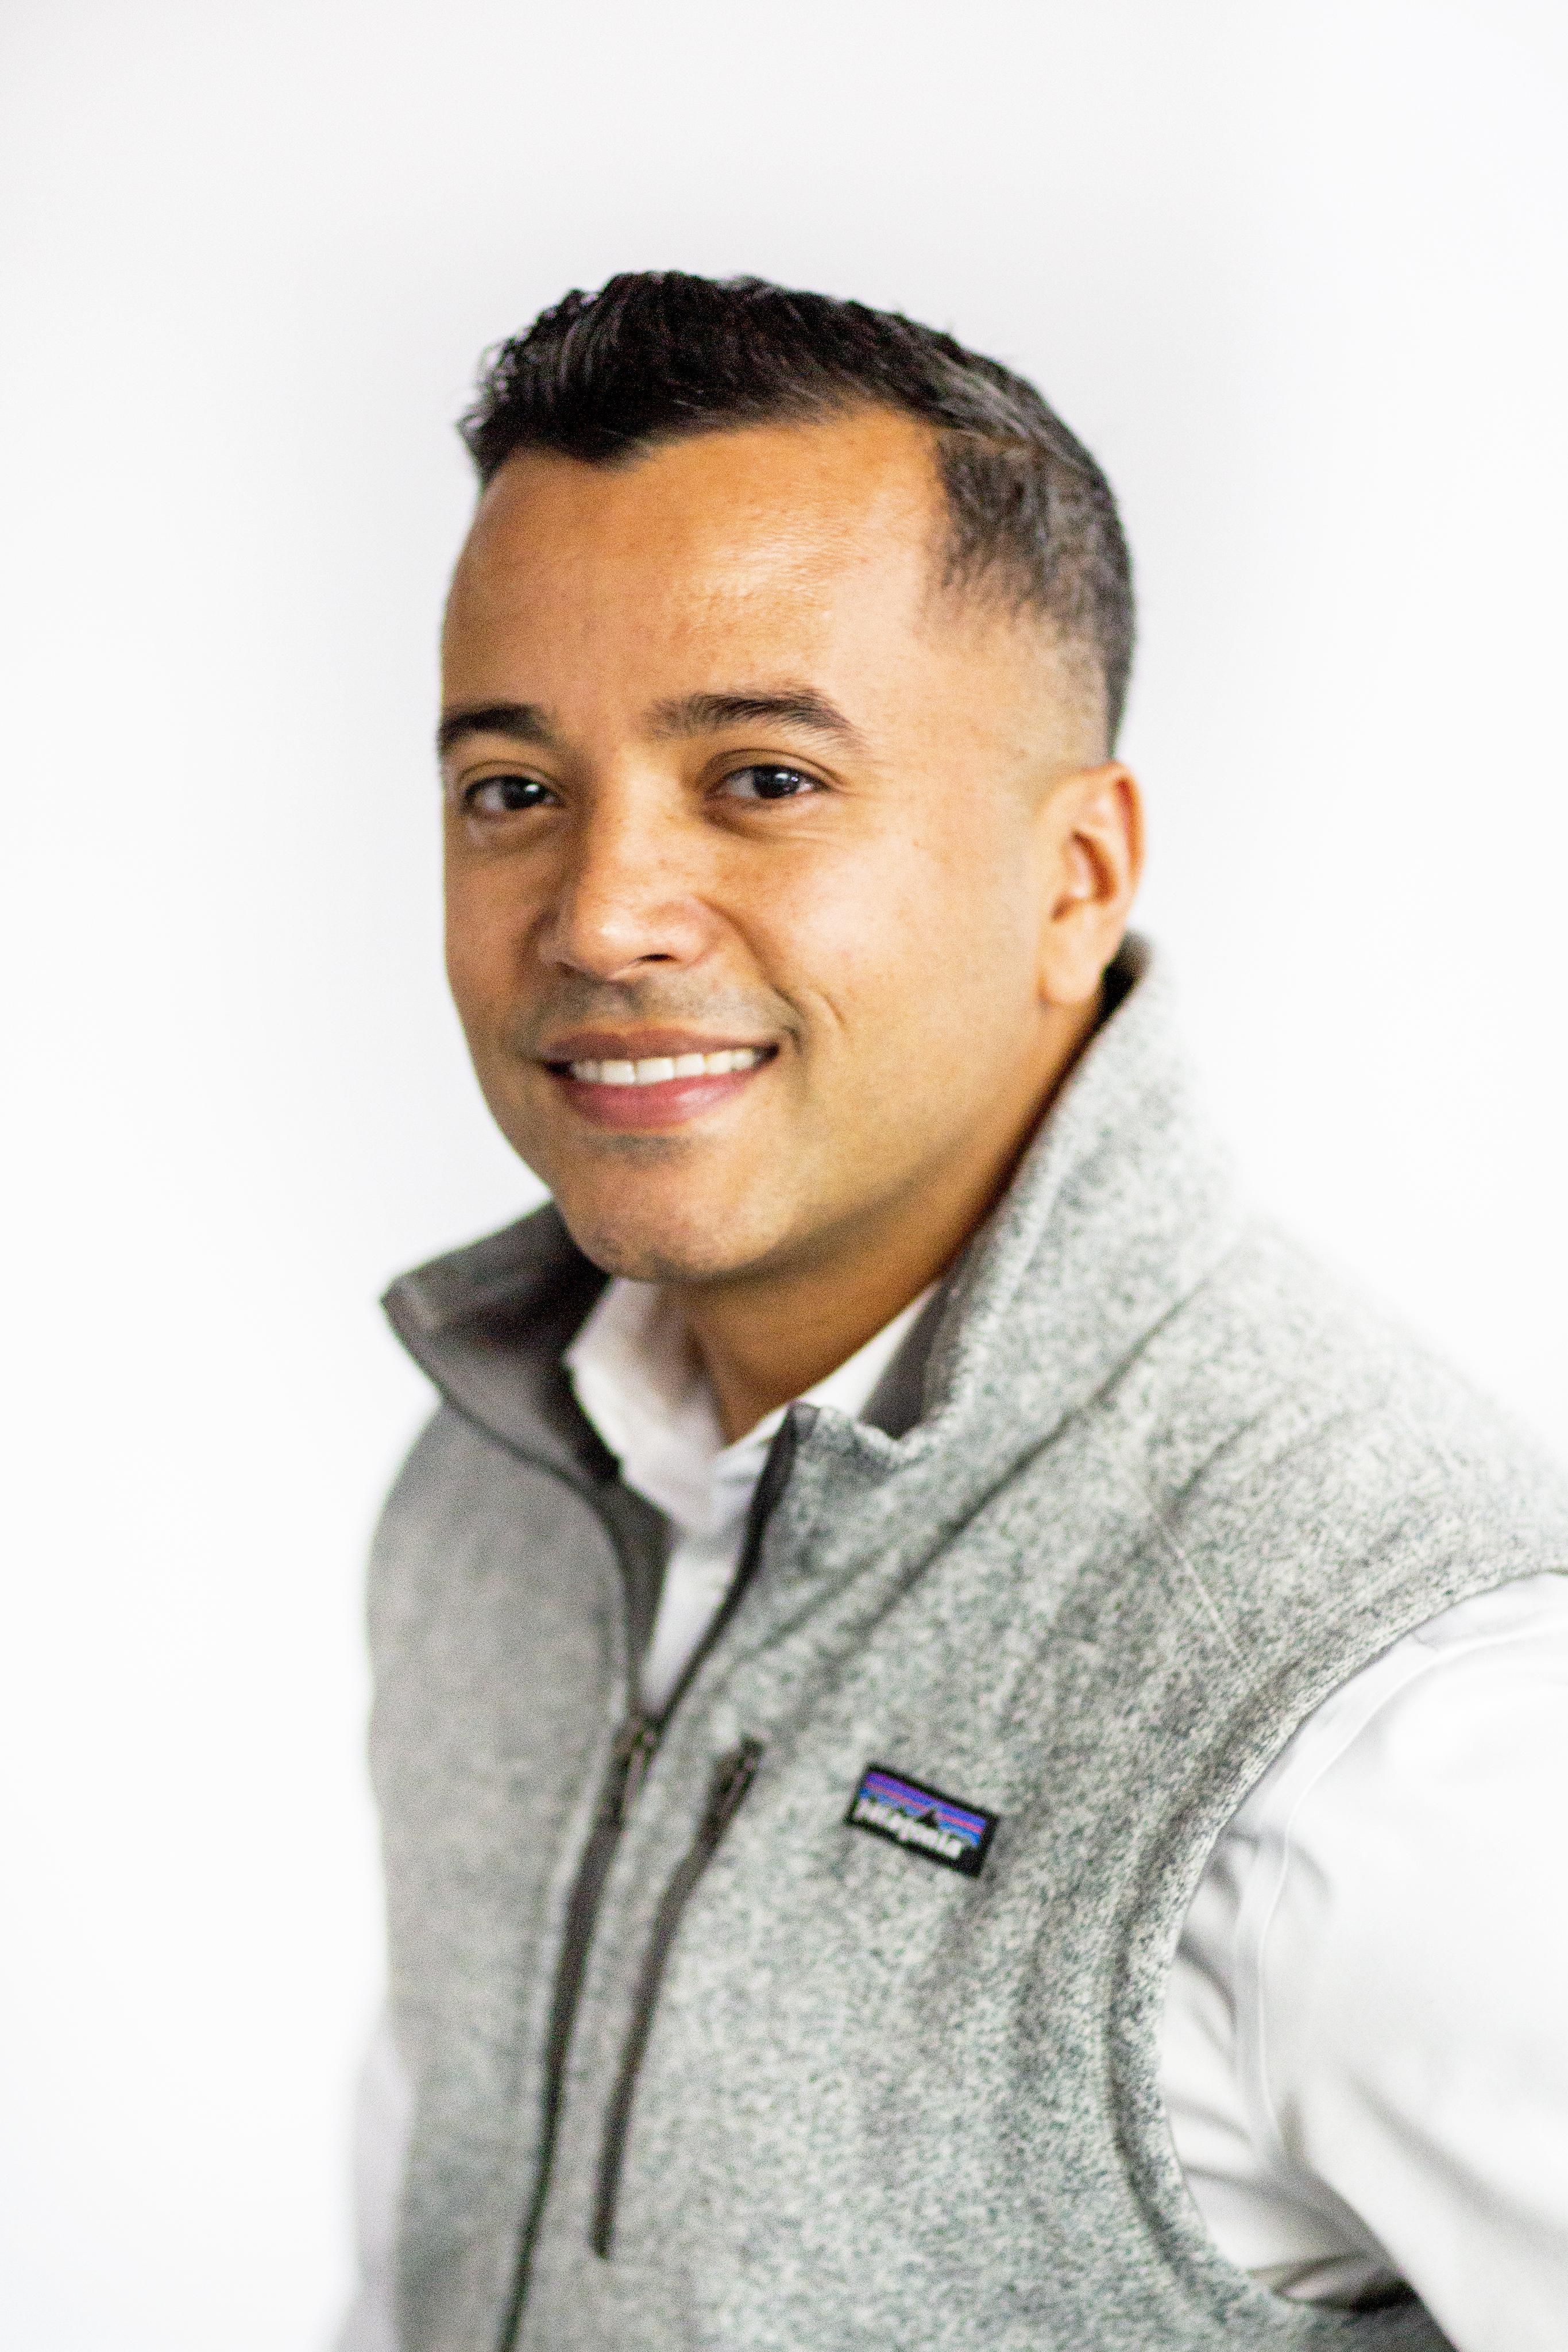 Angel Niever, Co-Founder of Vamos